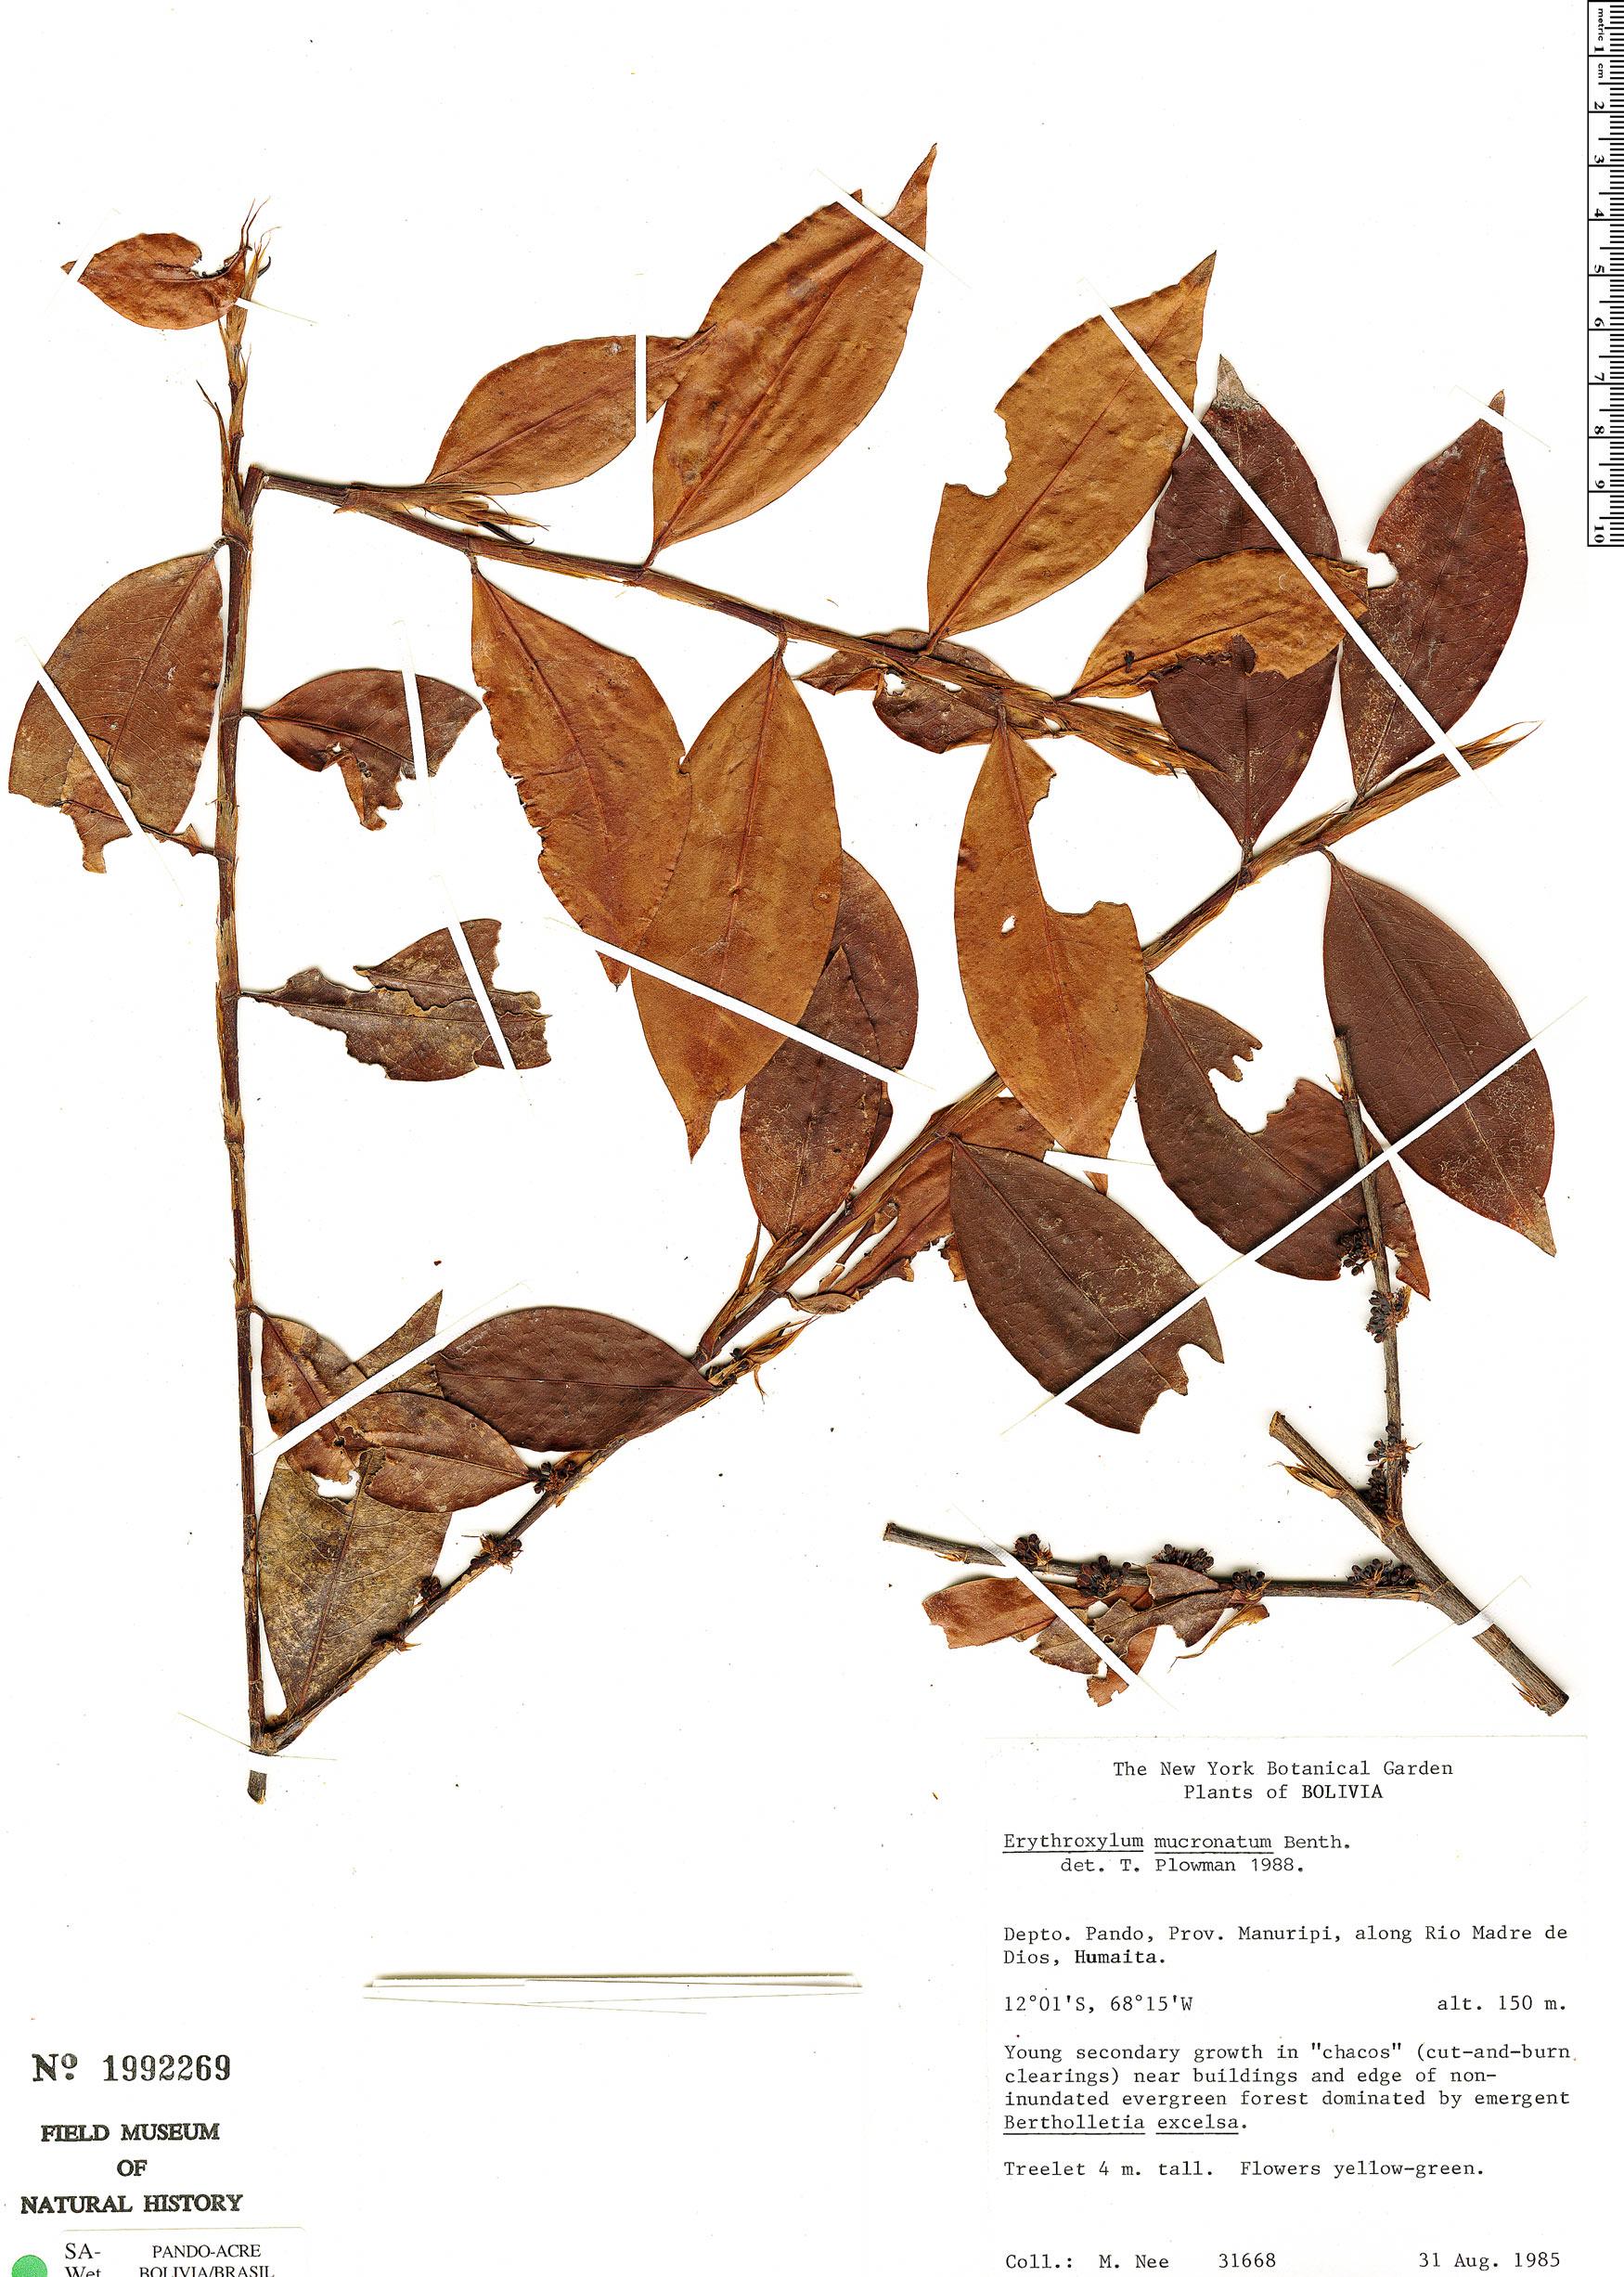 Specimen: Erythroxylum mucronatum